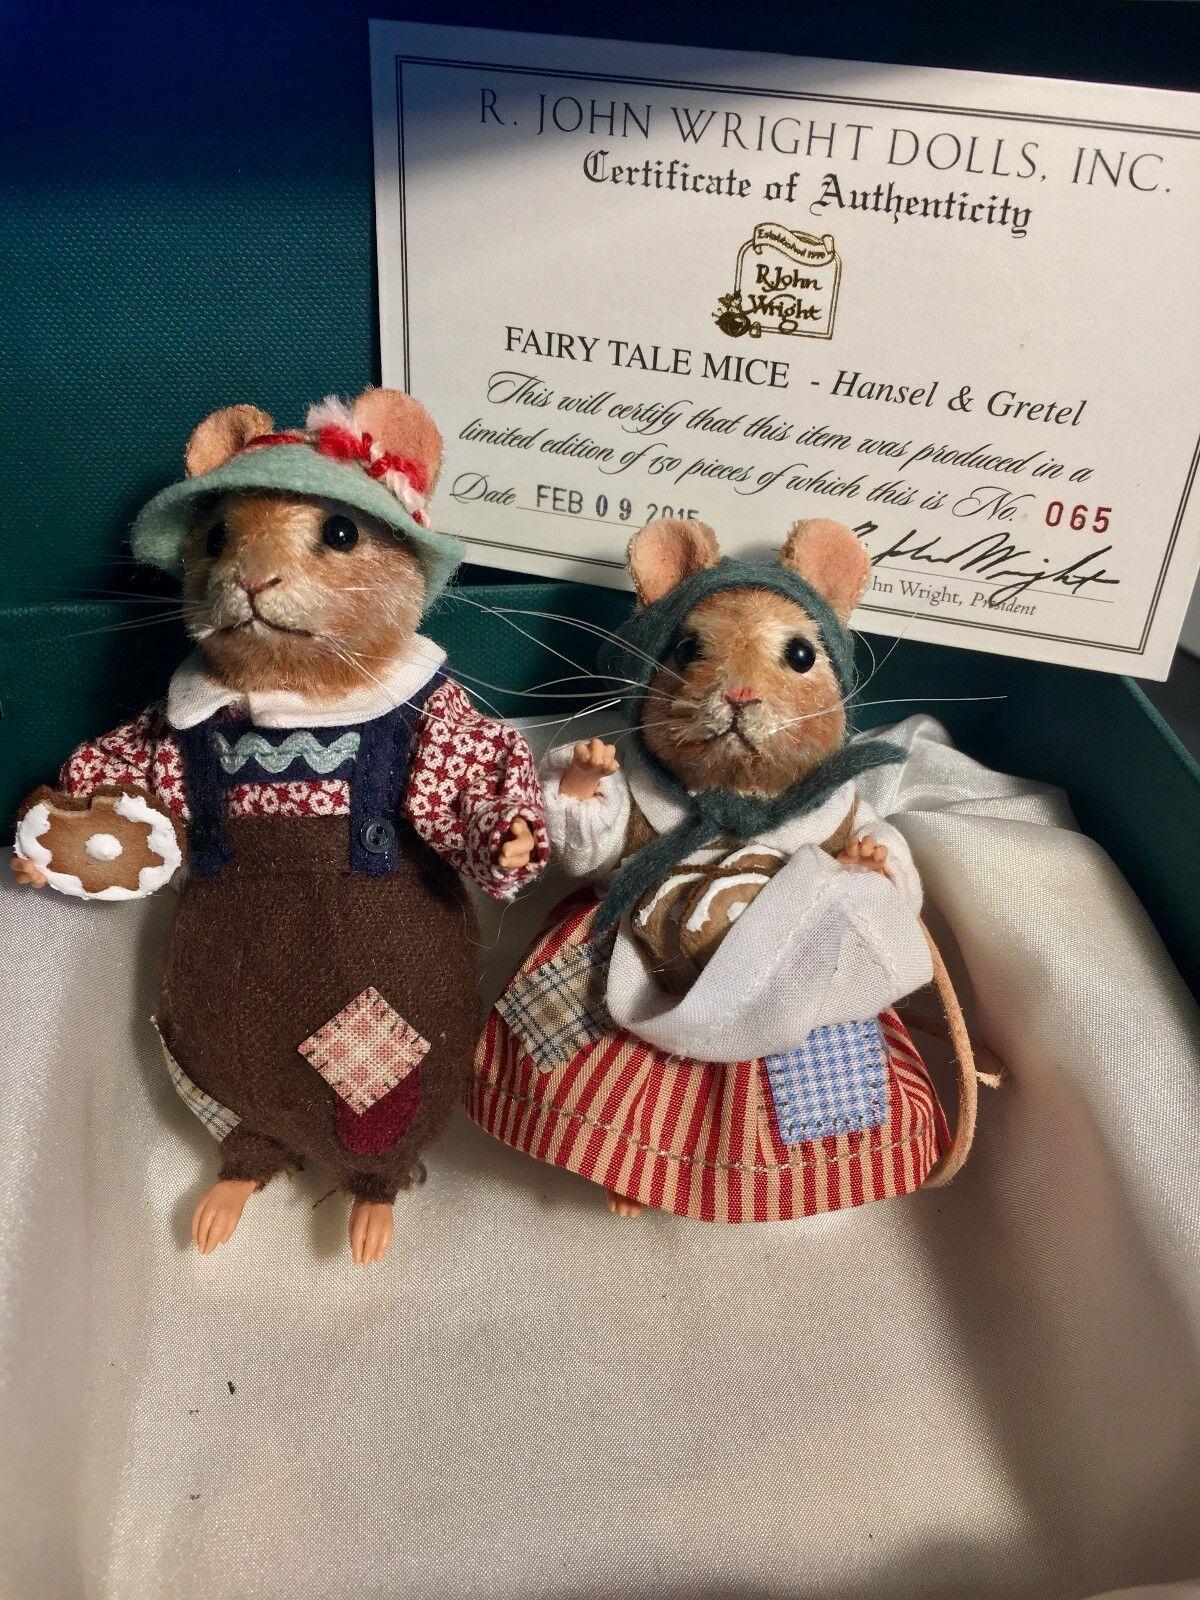 R john wright mice - Hansel & Gretel Fairy Tale Mice